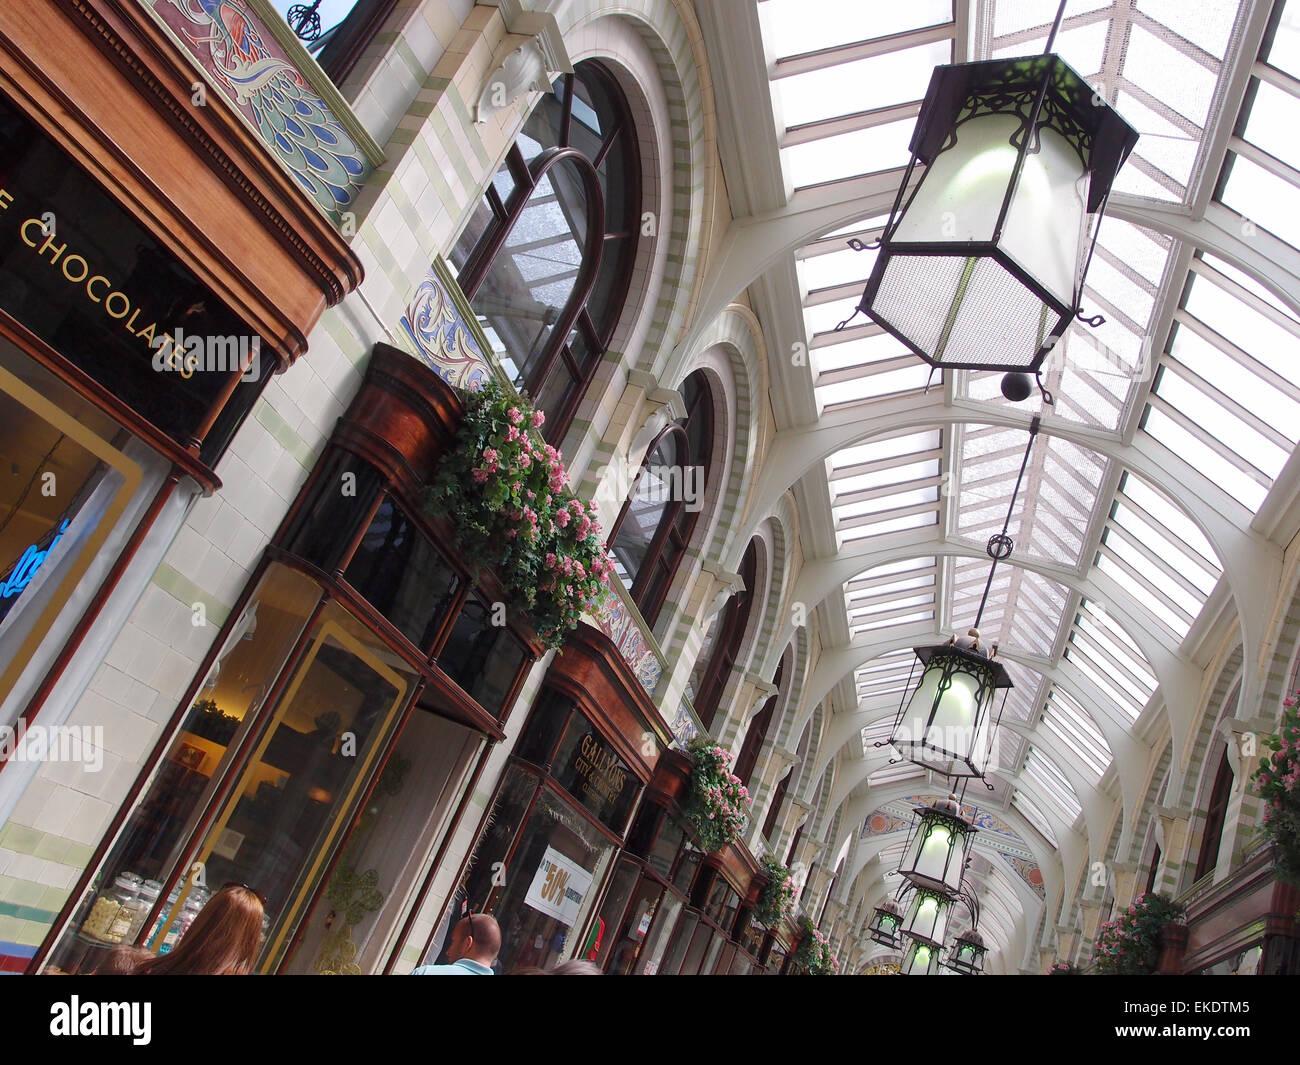 The Royal Arcade, Norwich, Norfolk, UK - Stock Image